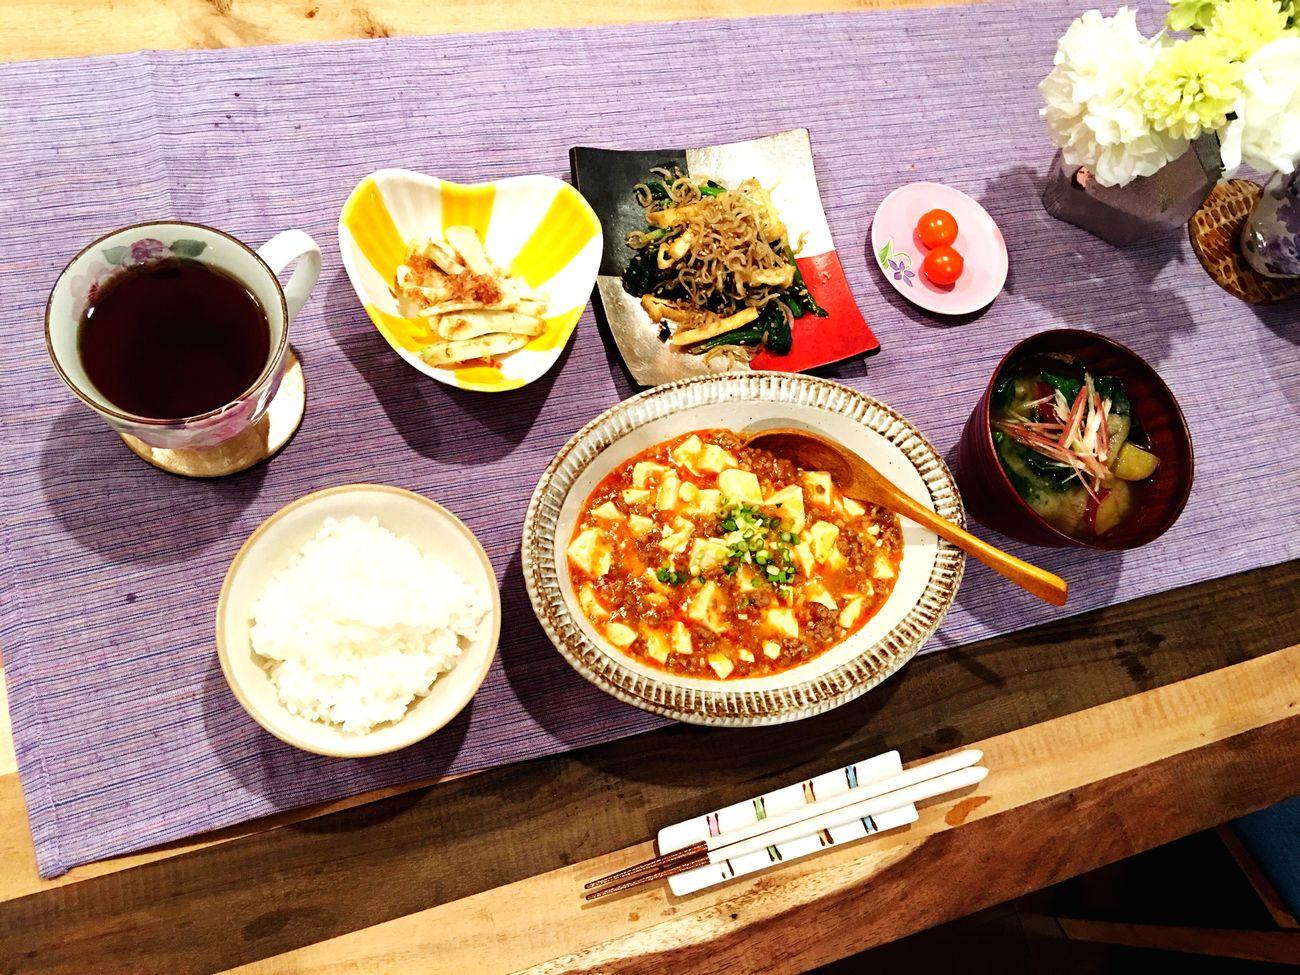 Today's Dinner 麻婆豆腐 ちぢみほうれん草とお揚げとジャコの炒め物 島らっきょうおかか和え サツマイモとごぼうとちぢみほうれん草のお味噌汁 プチトマト Mabo Tofu Spinach Aburaage Smallfish Fried Food Okinawashallot Katsuobushi Sweetpotato Burdock Miso Soup Petit Tomatoes 冬限定のちぢみほうれん草は甘くて美味しかった😋❤️ Ready-to-eat Healthy Eating Indoors  Foodporn Food Porn 創作料理 Yammy!!